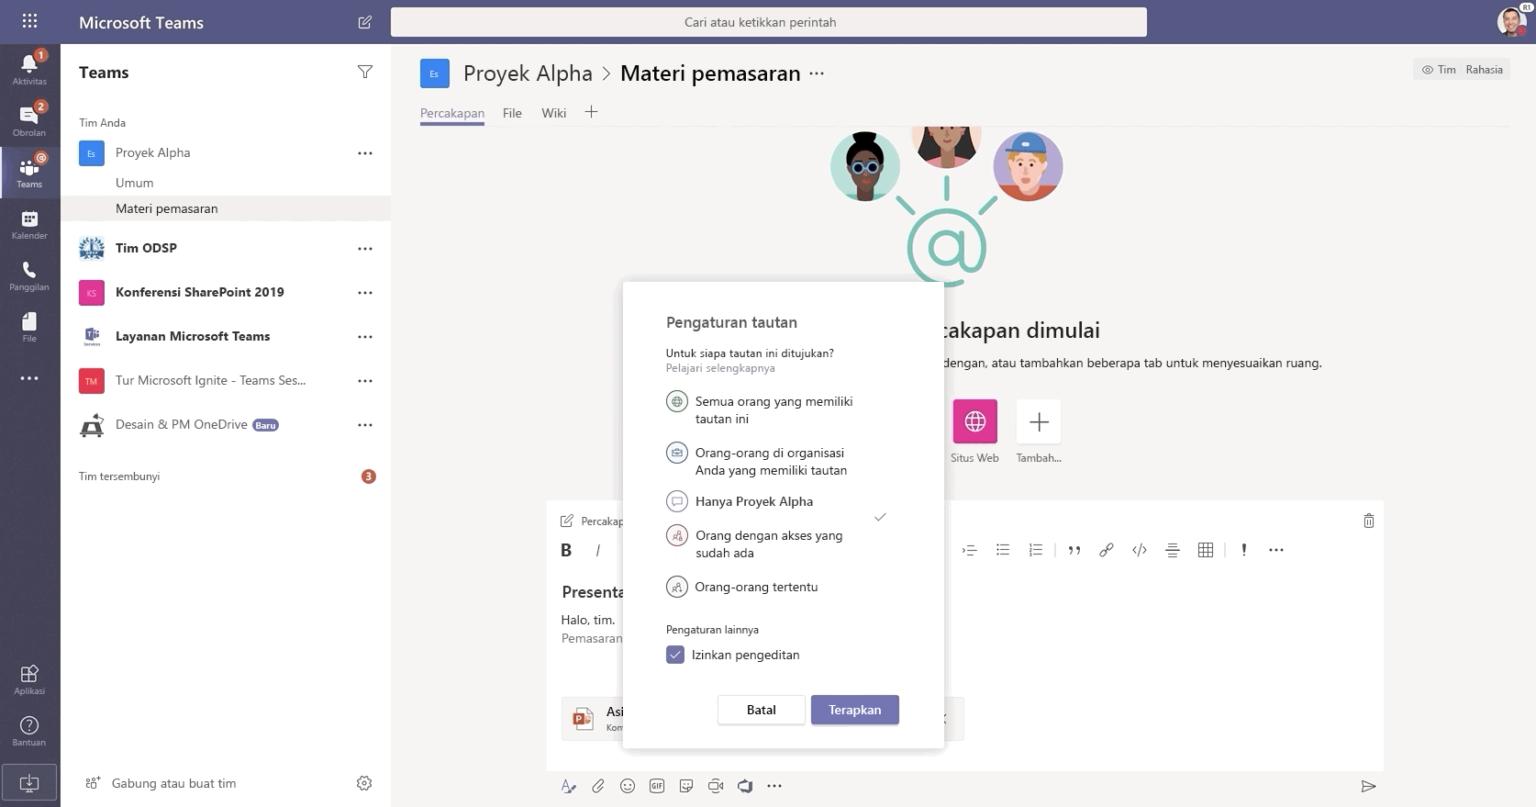 Gambar percakapan di Microsoft Teams.